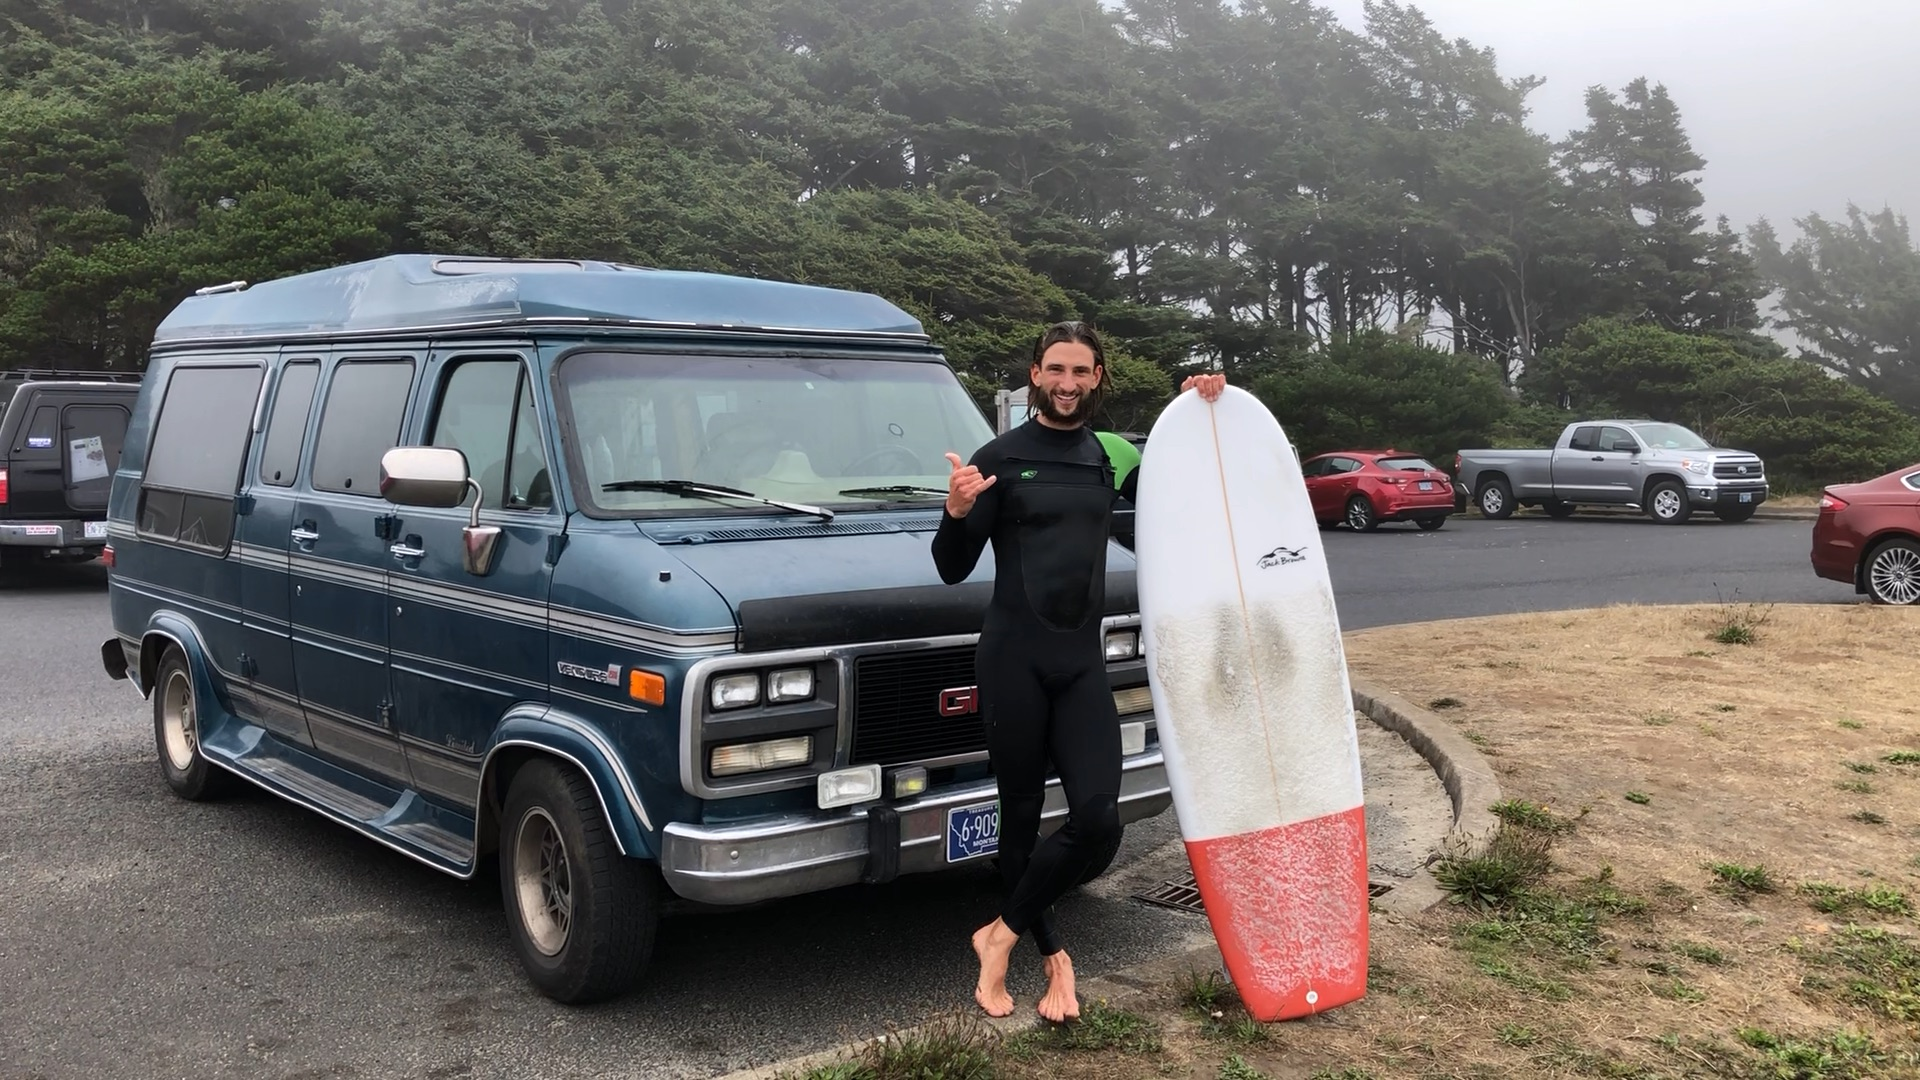 Australian-Matt-and-his-GMC-Vandura-campervan-on-a-west-coast-American-surf-trip